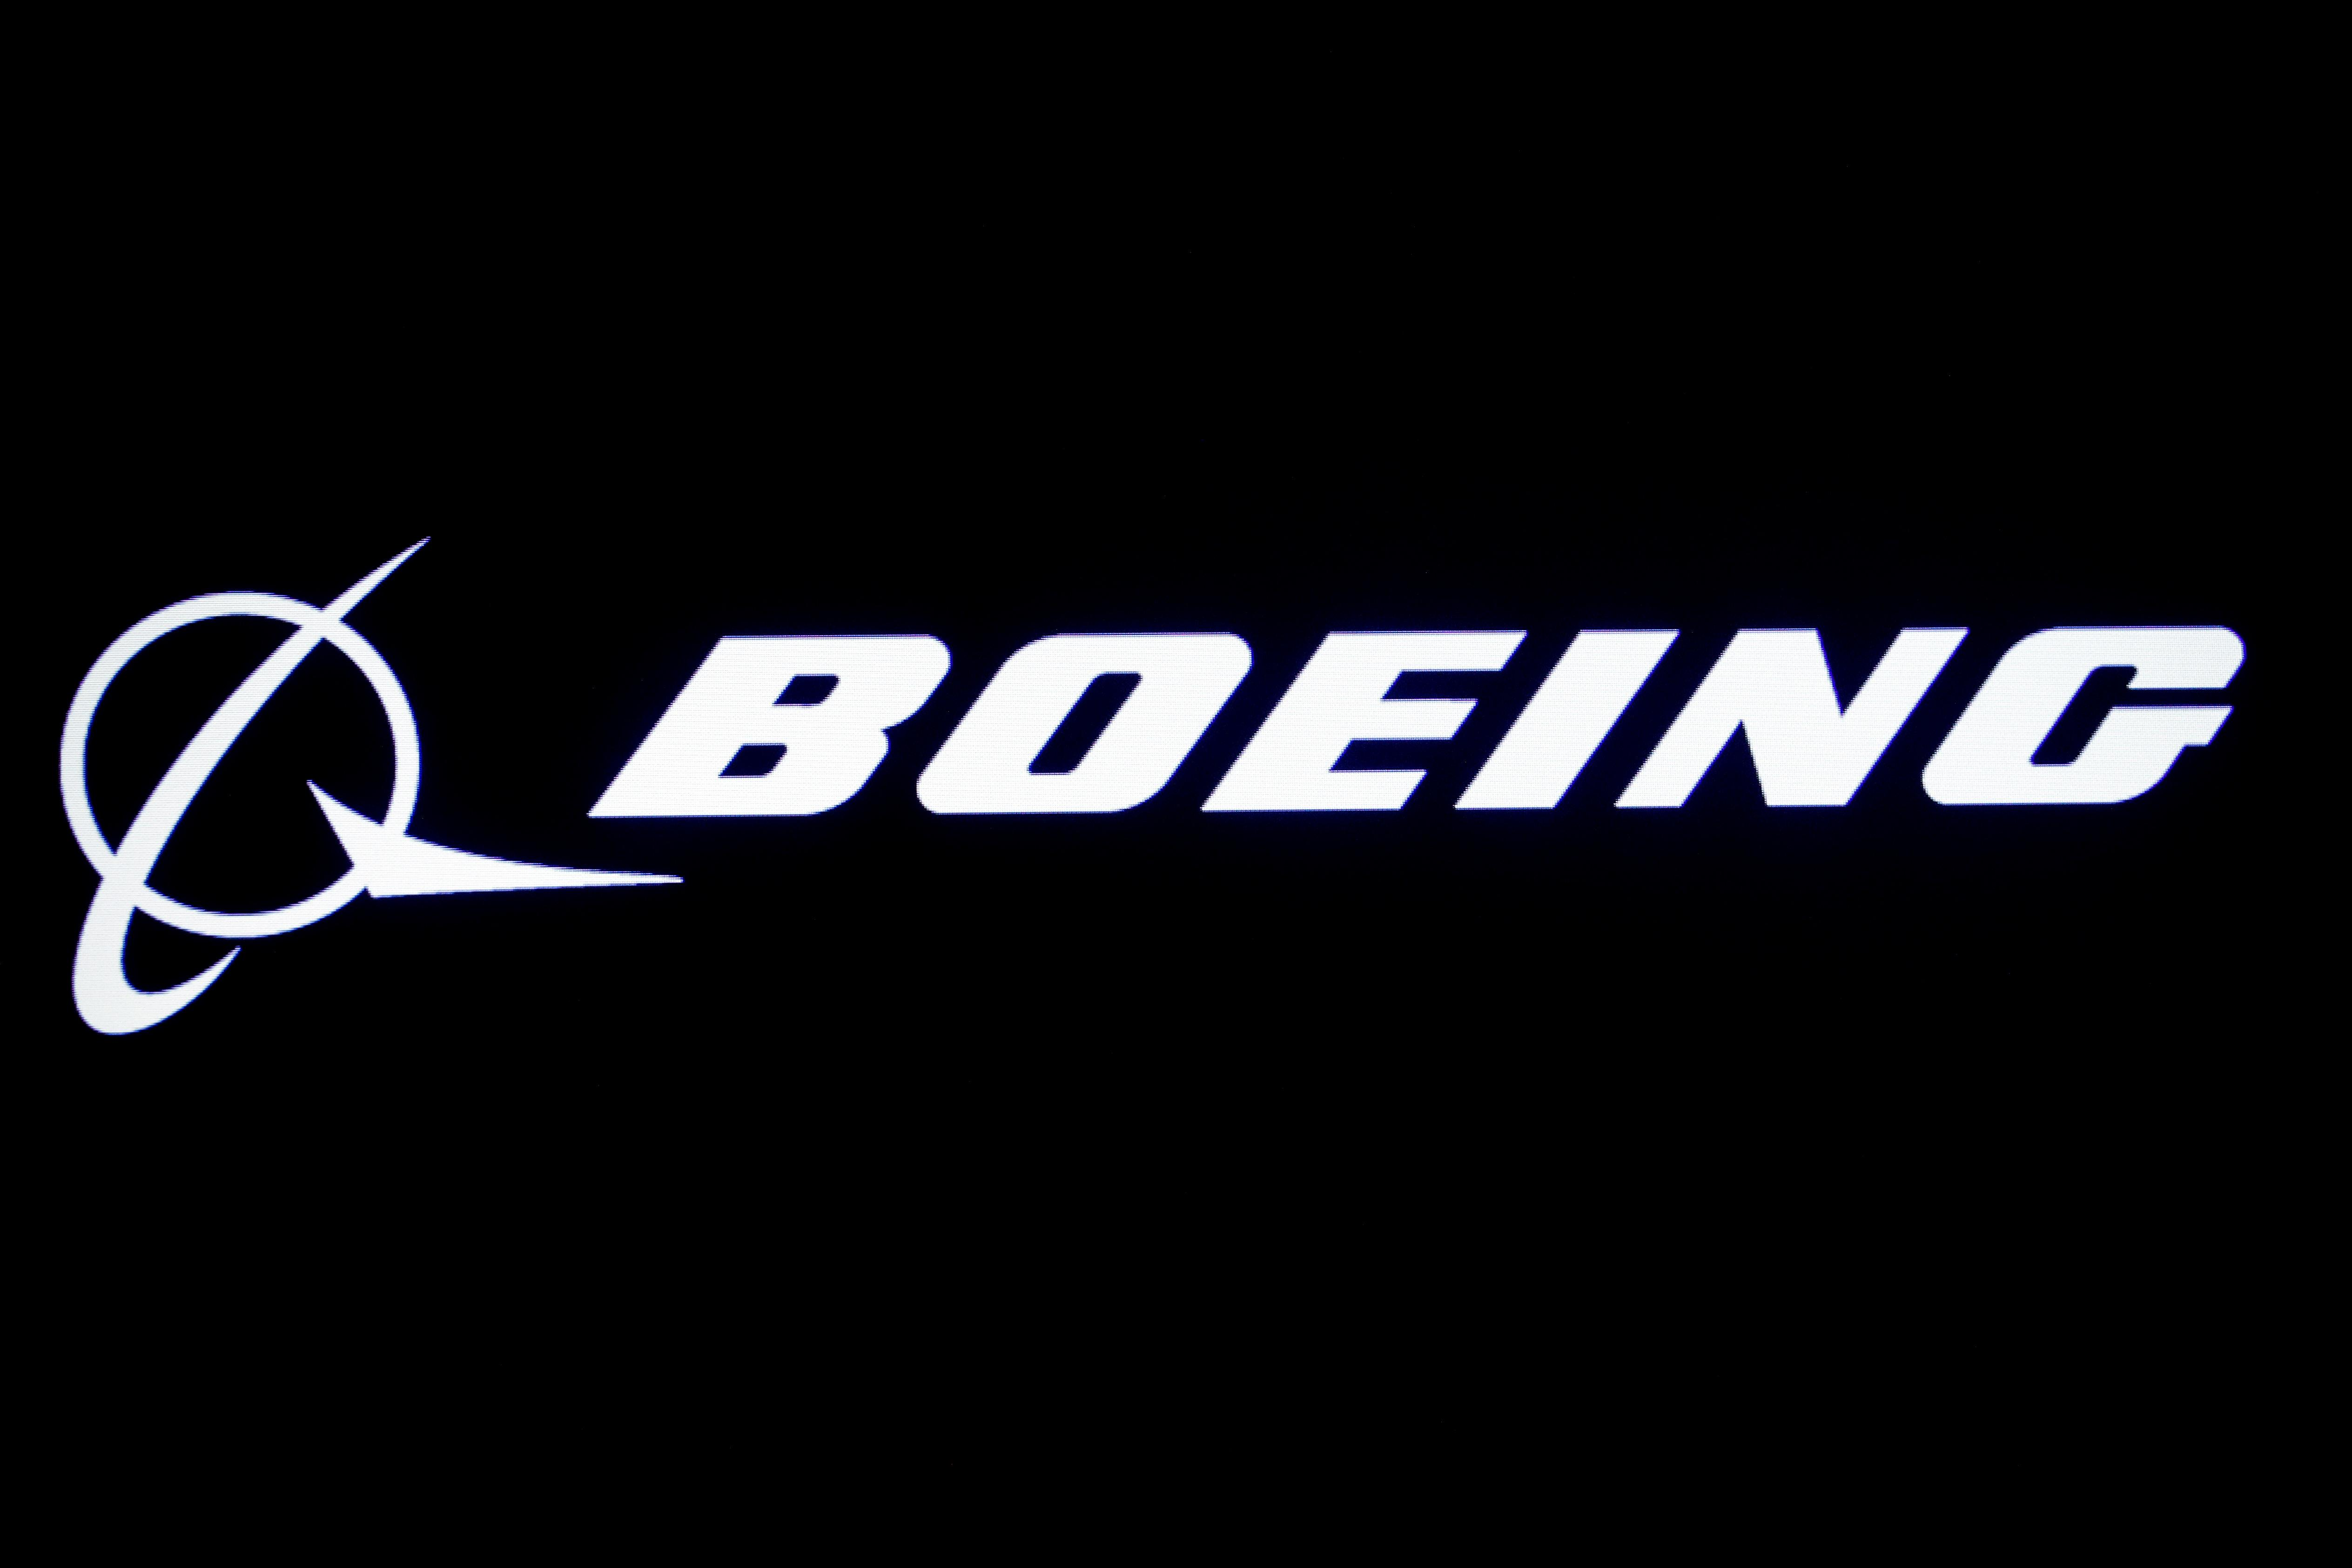 Senior U.S. lawmaker says Boeing must shake-up management after 737...